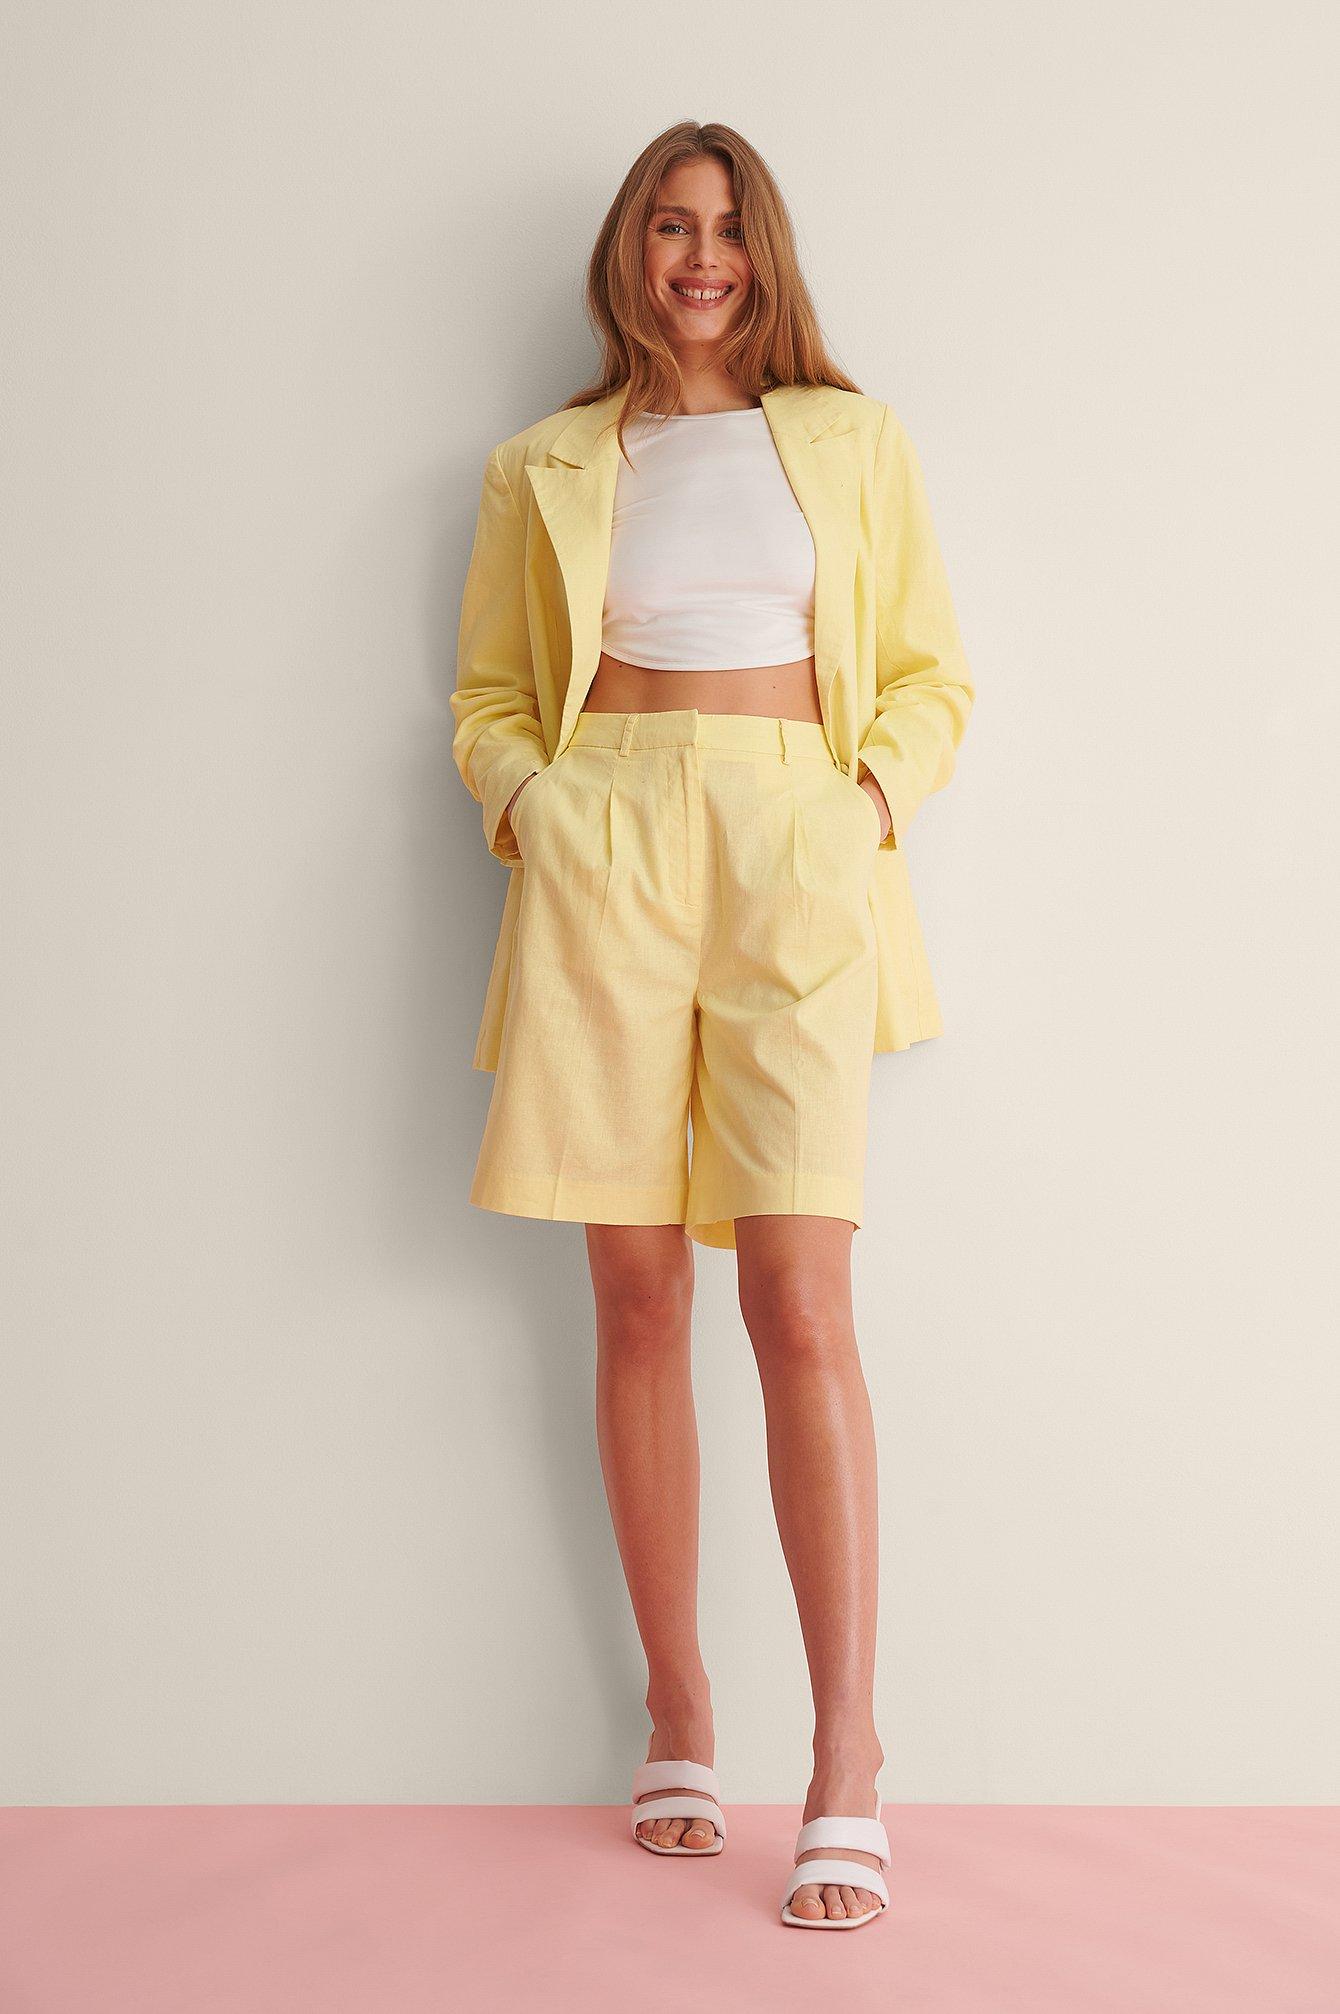 Oversized Linen Blend Shorts $47.95